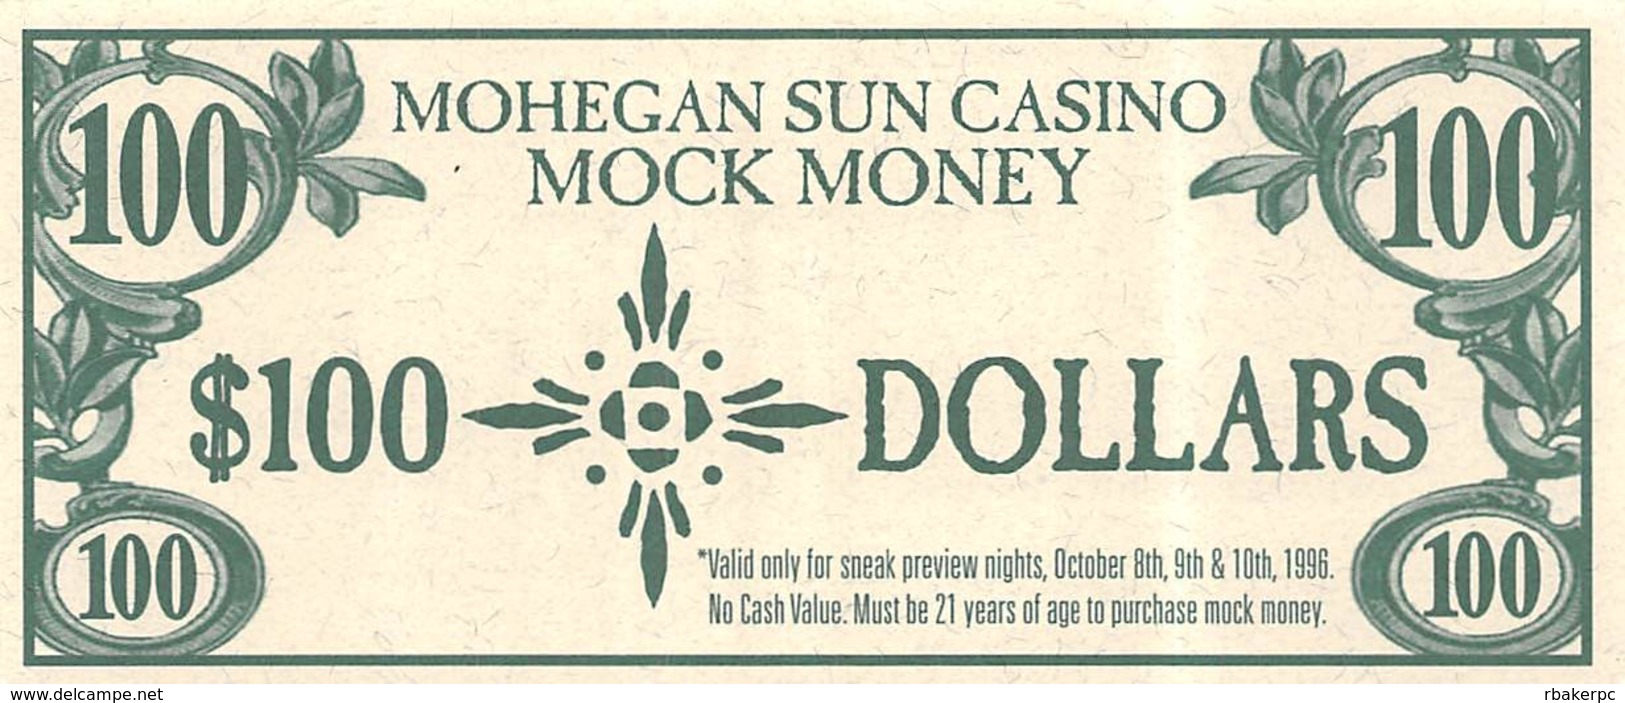 Mohegan Sun Casino - Uncasville, CT USA - $100 Mock Money Bill From Preview Night Oct 8-10, 1996 - Casino Cards